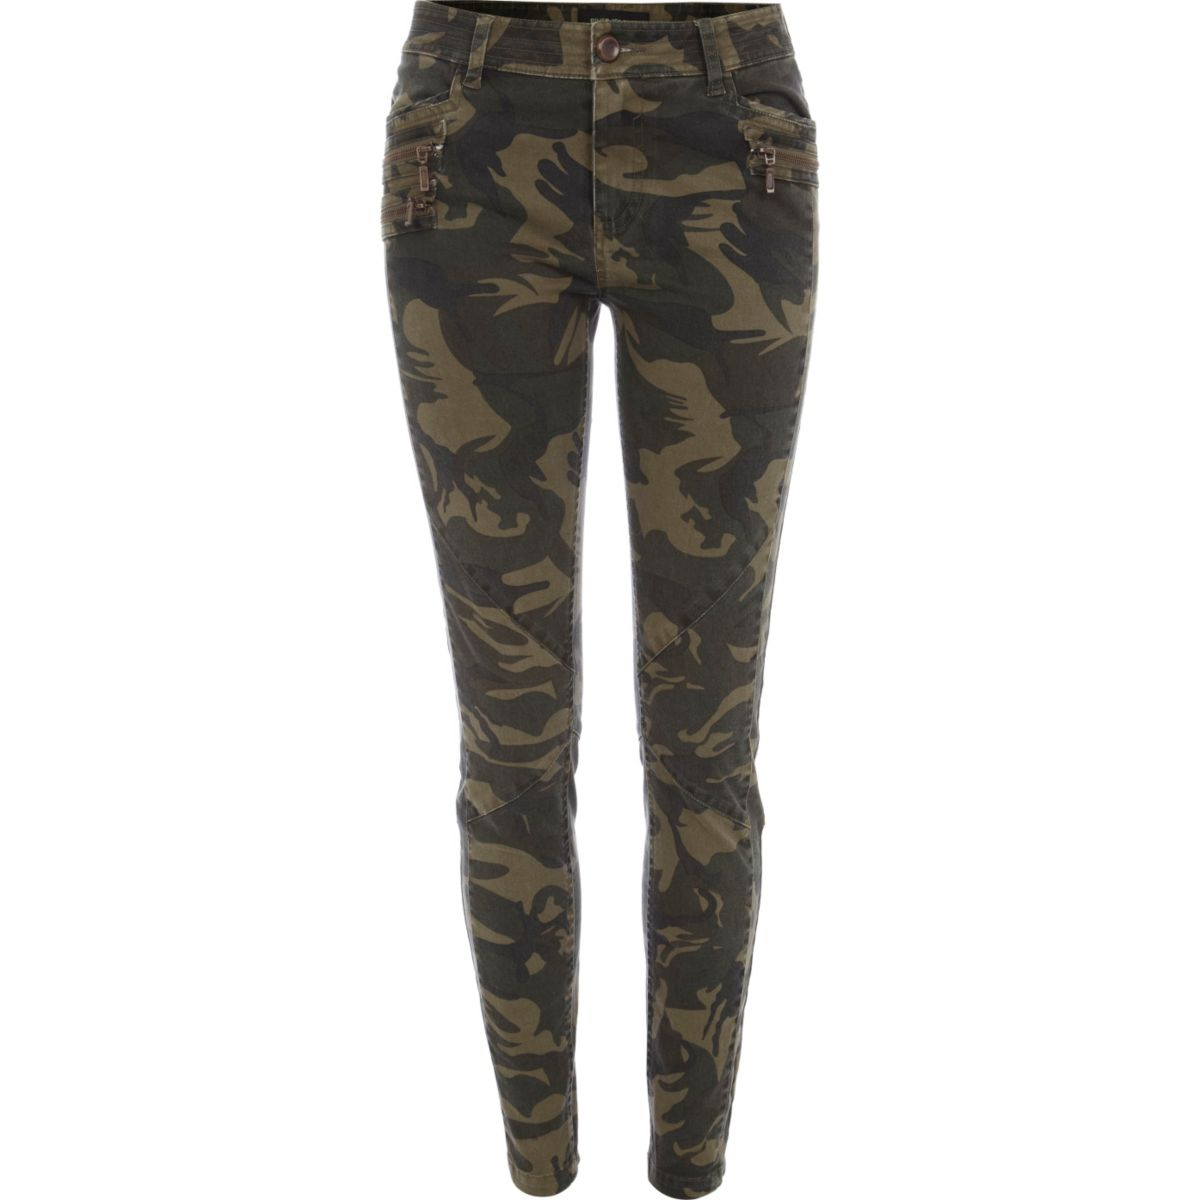 Khaki camo print skinny pants